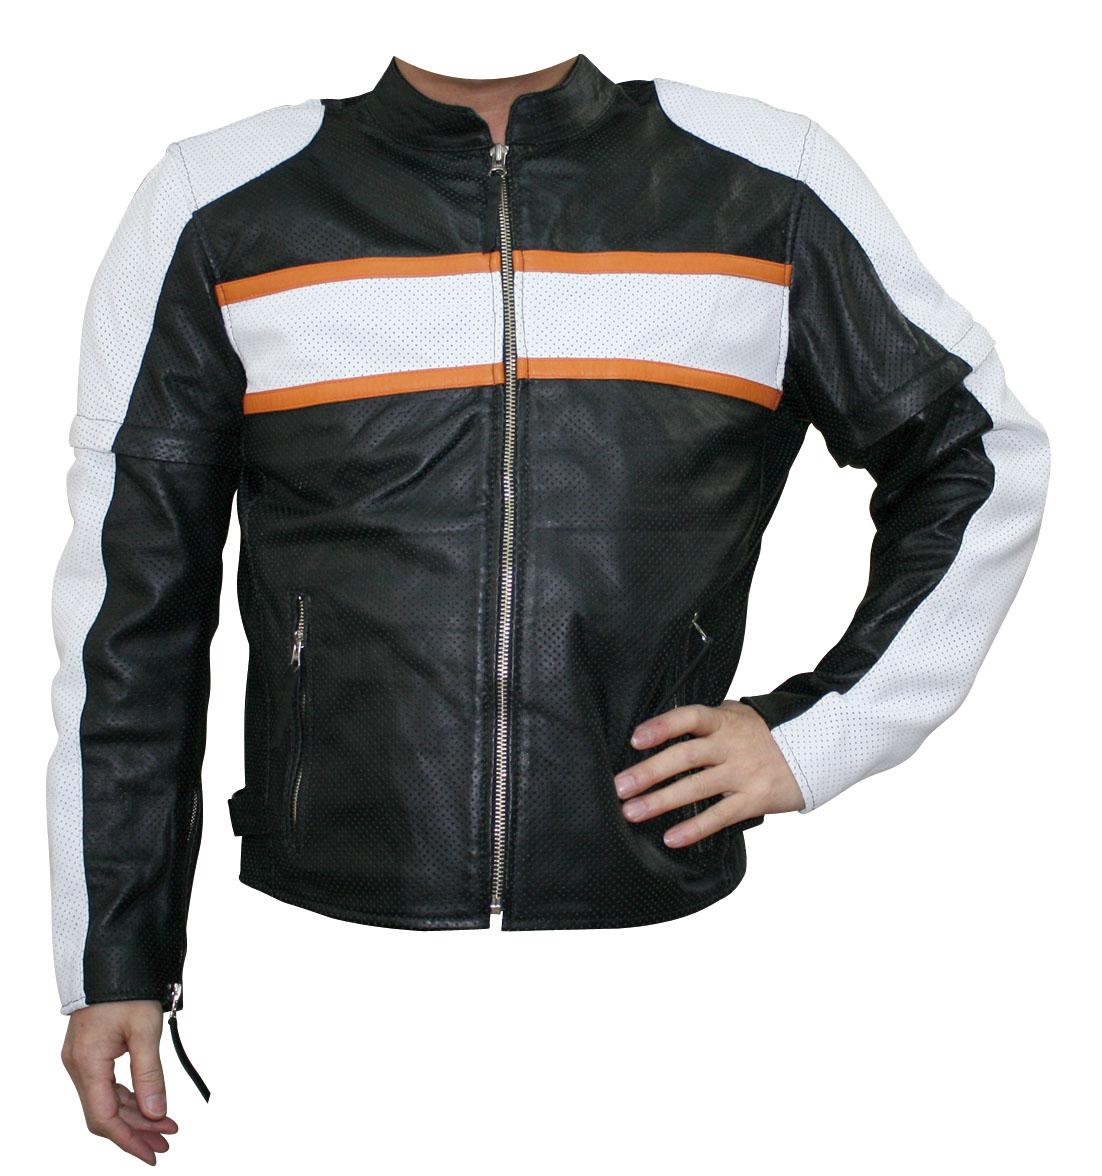 MF-LJ019P モトフィールド MOTO FIELD 春夏モデル シープパンチングレザージャケット 黒/白 5Lサイズ MF-LJ019PK JP店